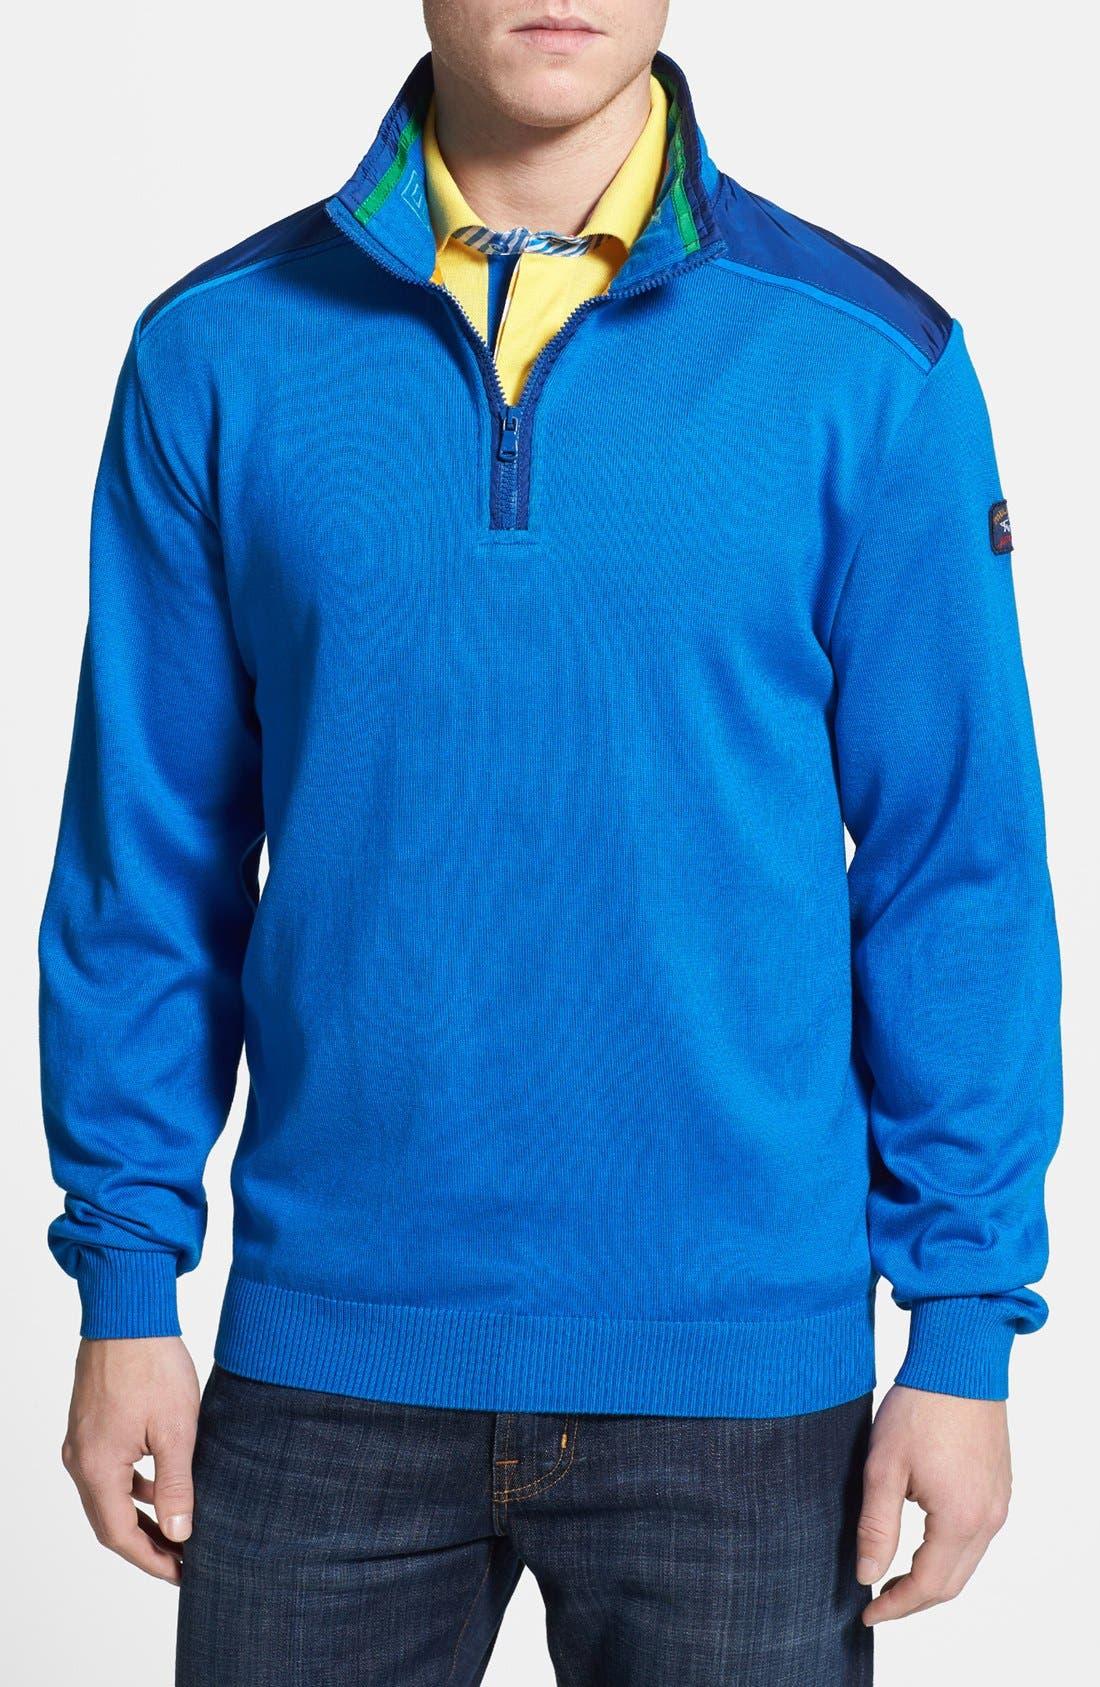 Alternate Image 1 Selected - Paul & Shark Classic Fit Quarter Zip Sweater